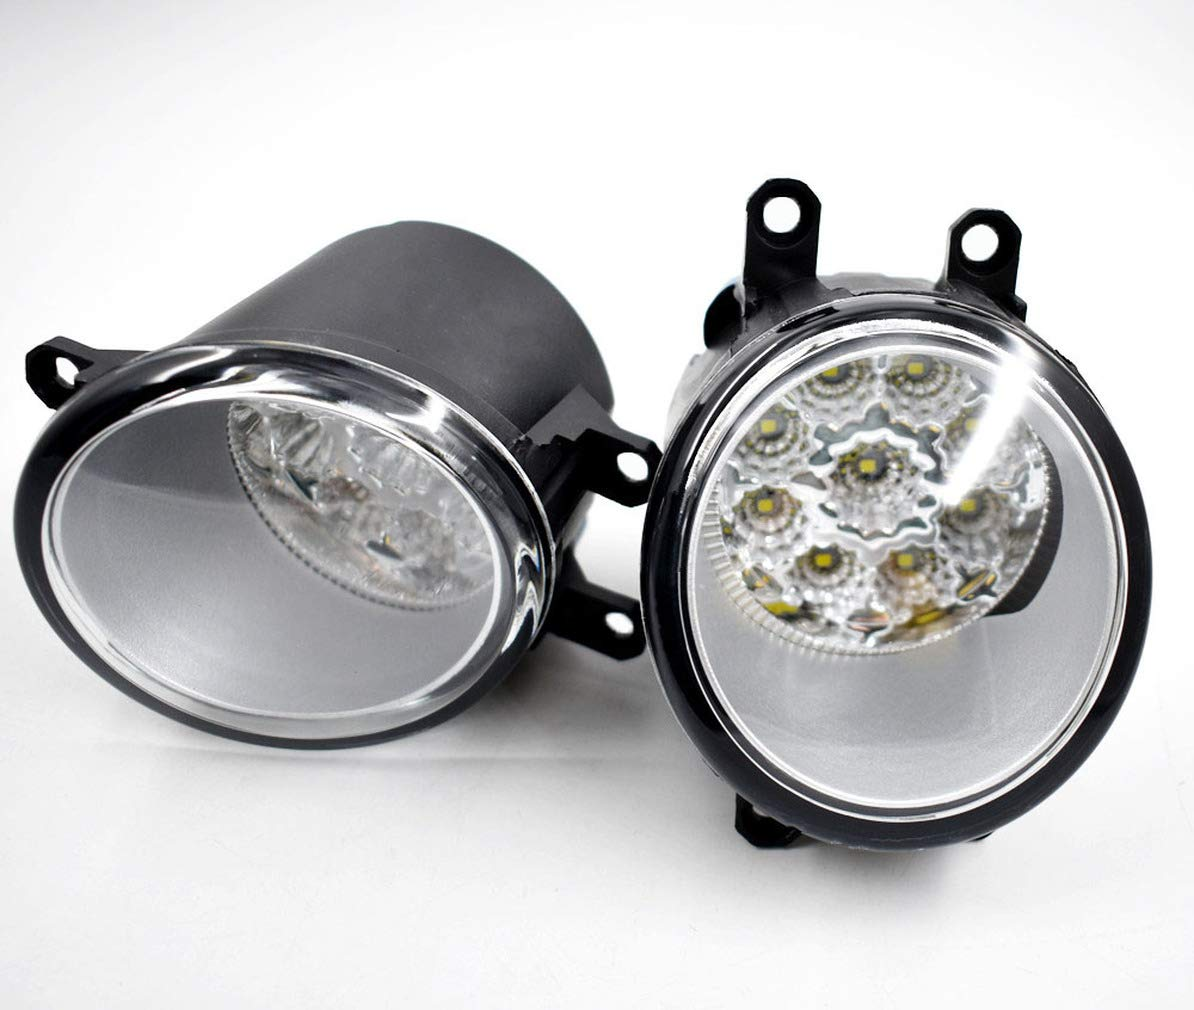 Pair of 36W LED Fog Light H8 H9 H11 Left Right RH LH Side Fit for Toyota RAV4 Camry Yaris Lexus 8121006071 8122006071